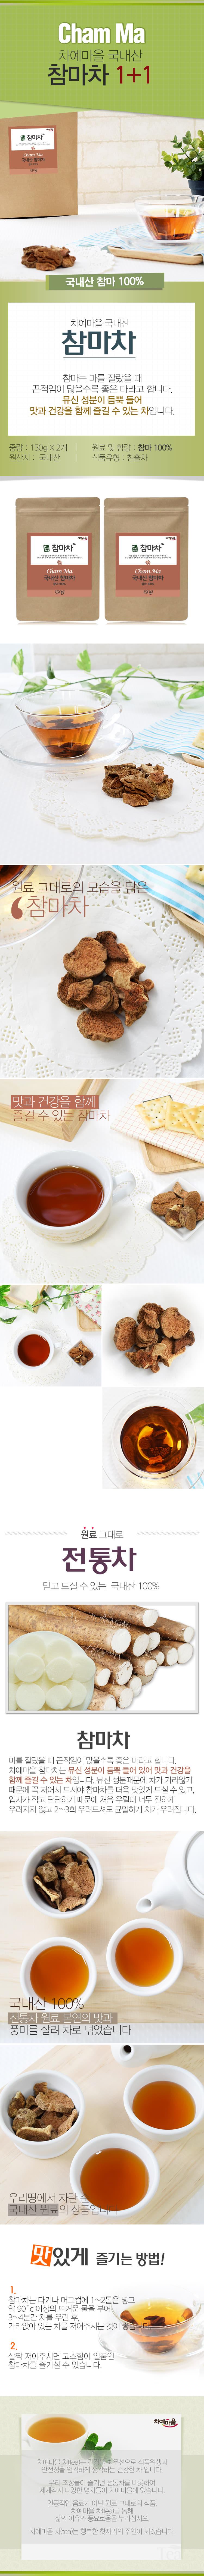 [ AndongWhiteLotus ] [ ChayeTown ]韩志刚茶 150g 1 个+1